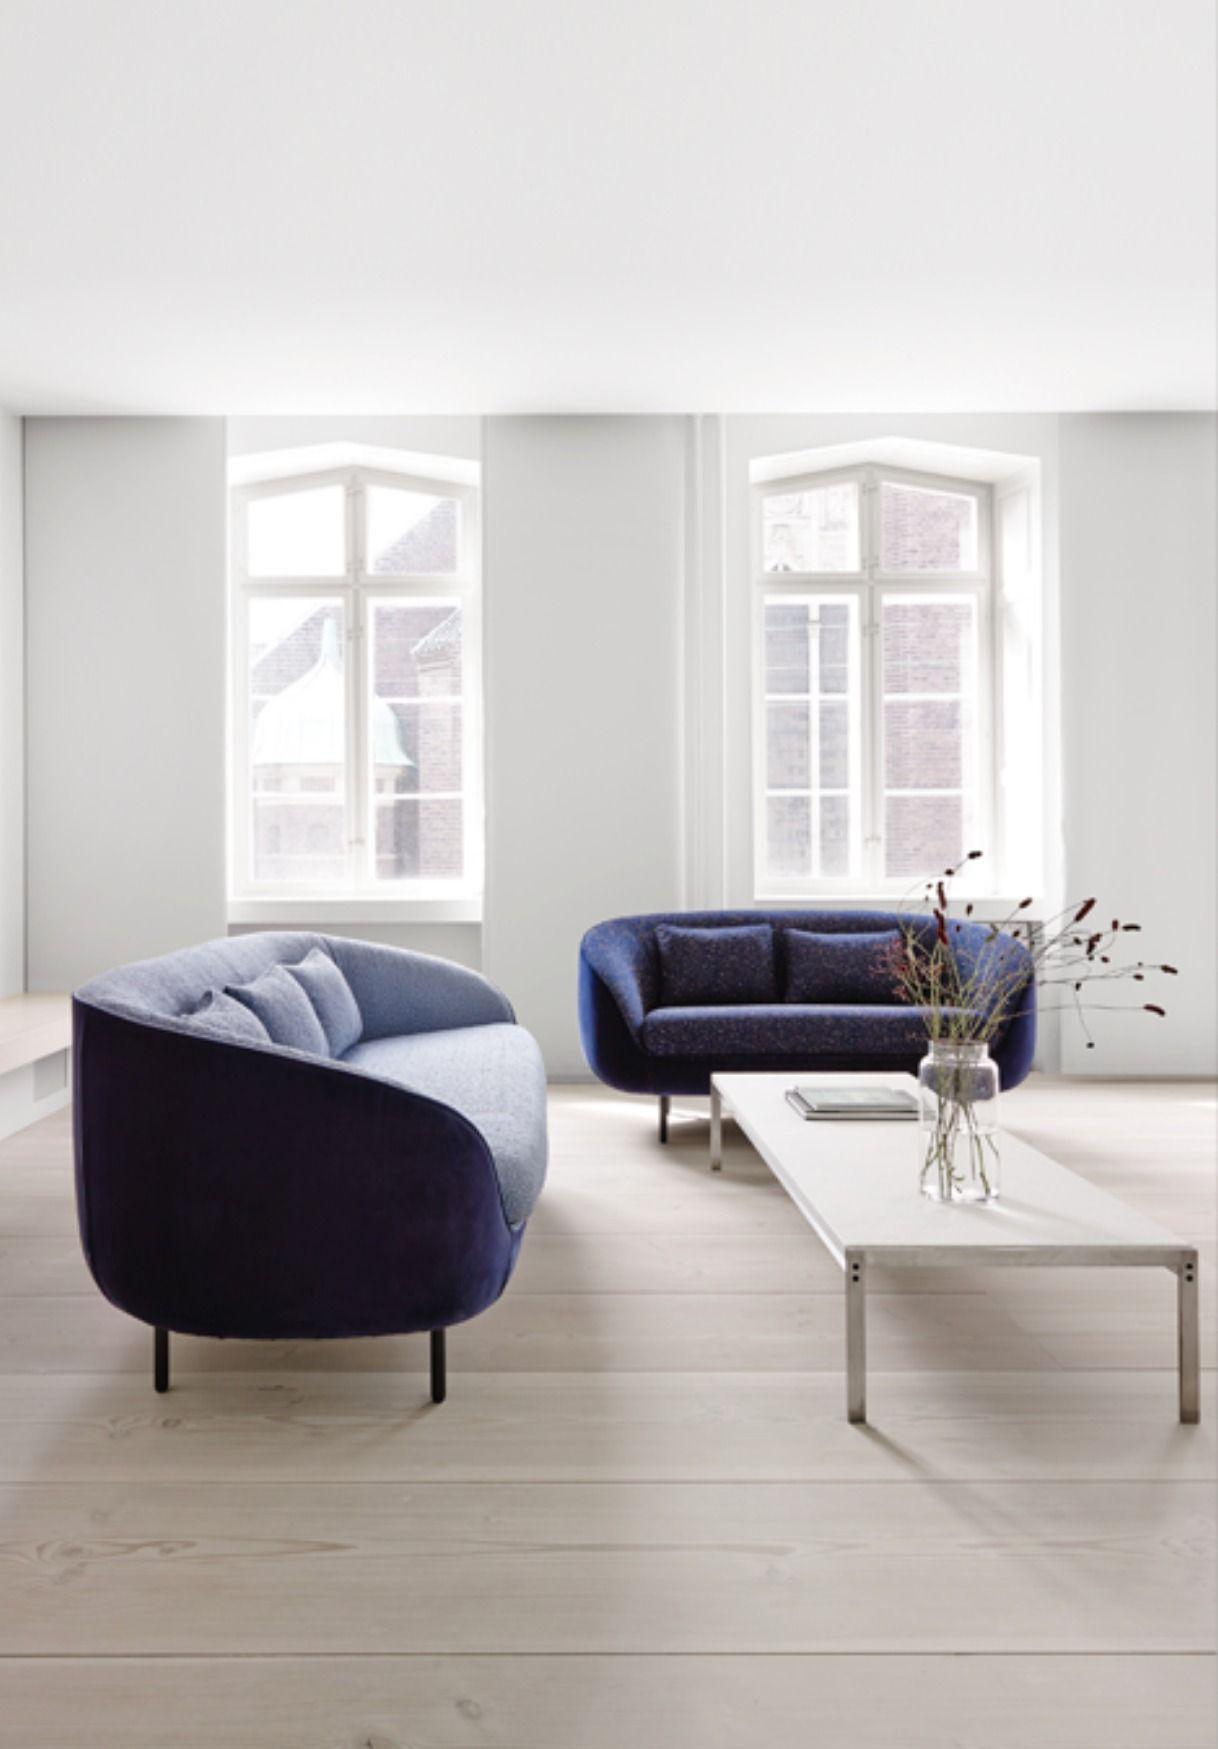 Fredericiafurniture haiku designinspiration designinspo interiordesigninspiration space interiors modern furniture also anthom design house anthomdesignhouse on pinterest rh